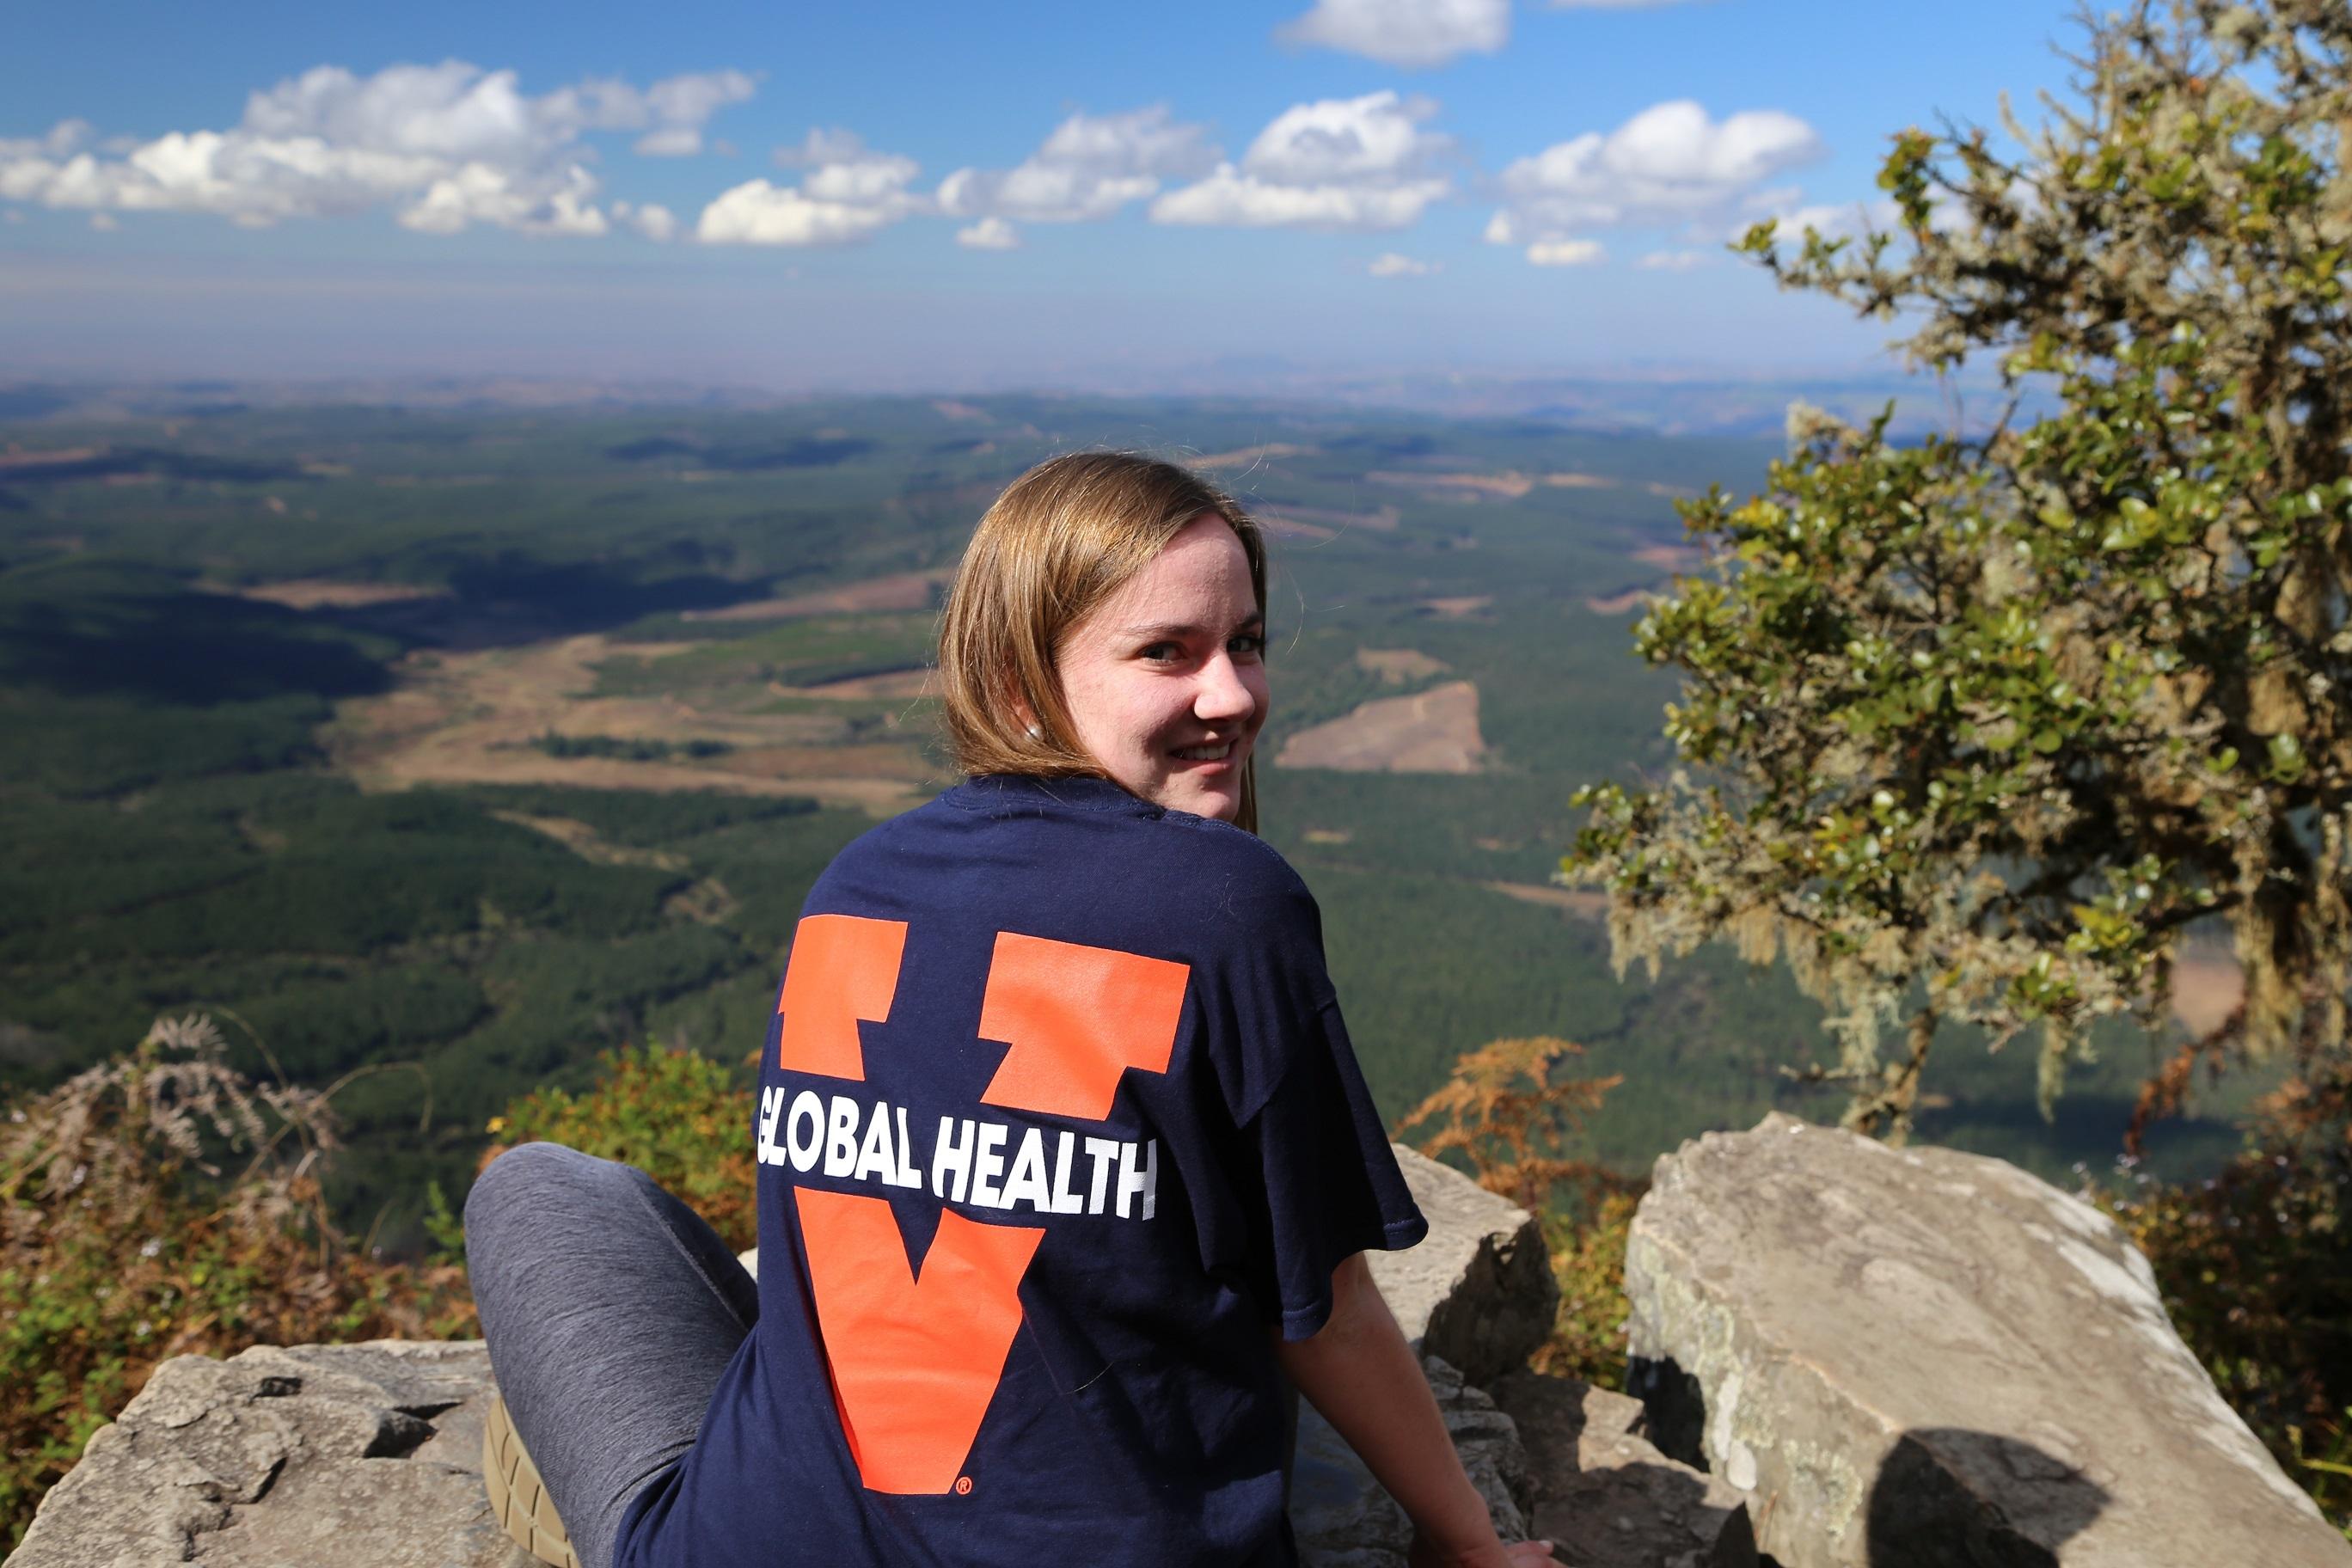 2015 CGH Scholar Callie Johnson in South Africa